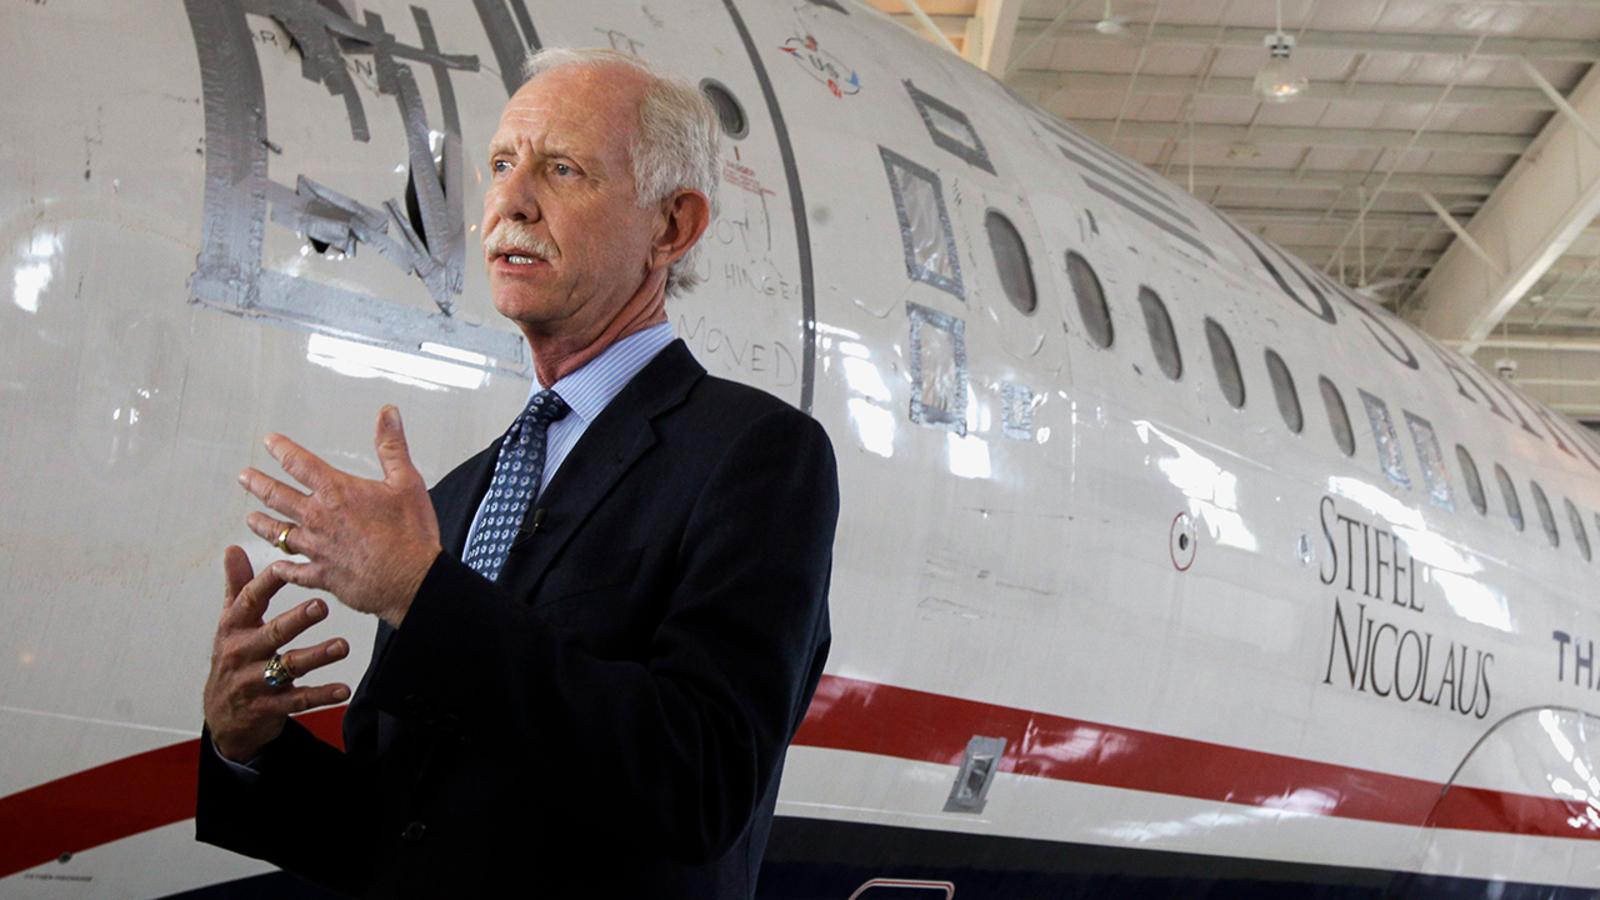 Biden names 9 ambassador nominees, including Captain 'Sully' Sullenberger